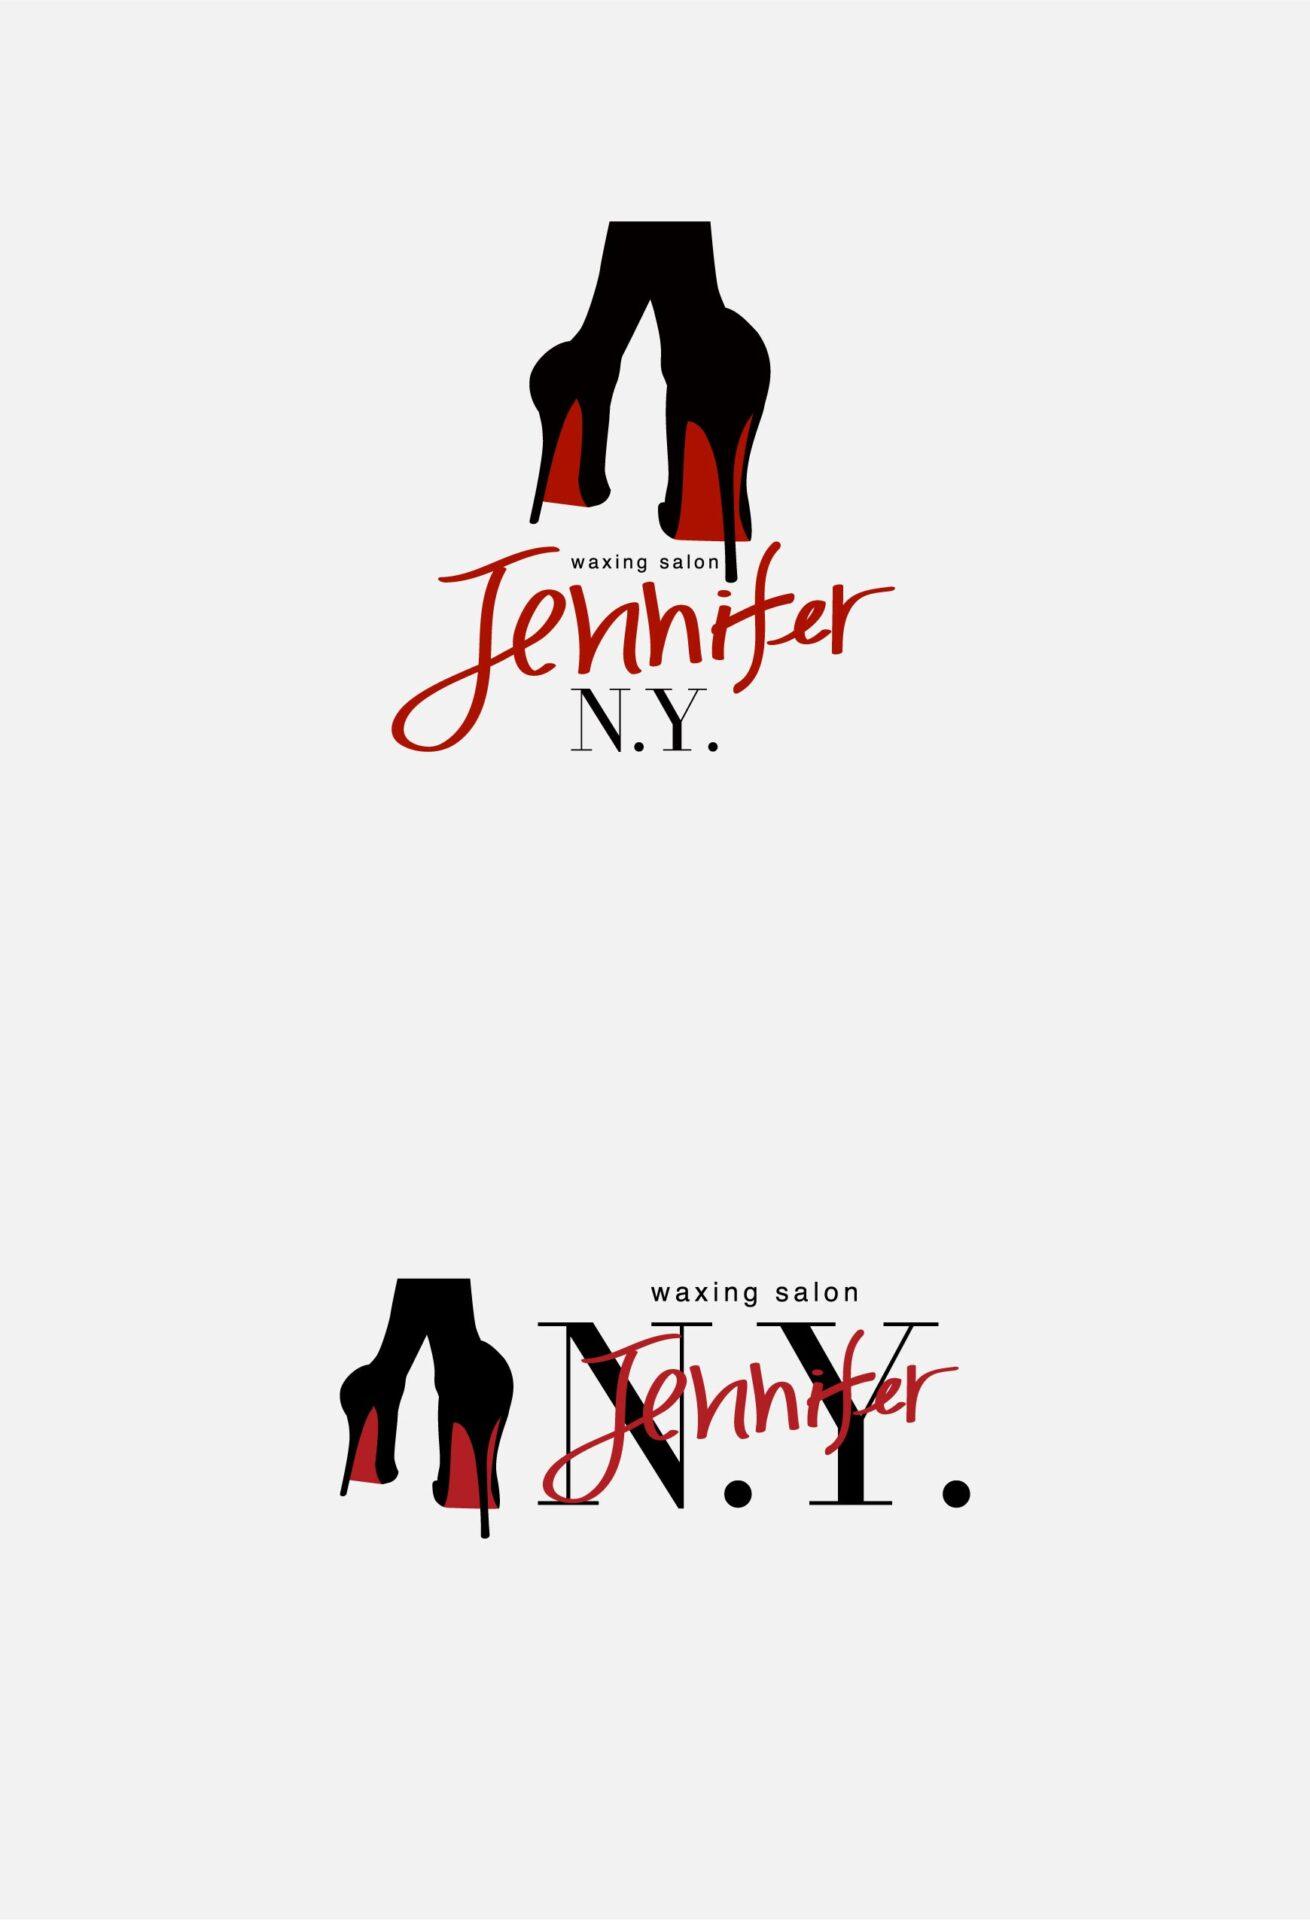 「JENNIFER N.Y.」の実績画像